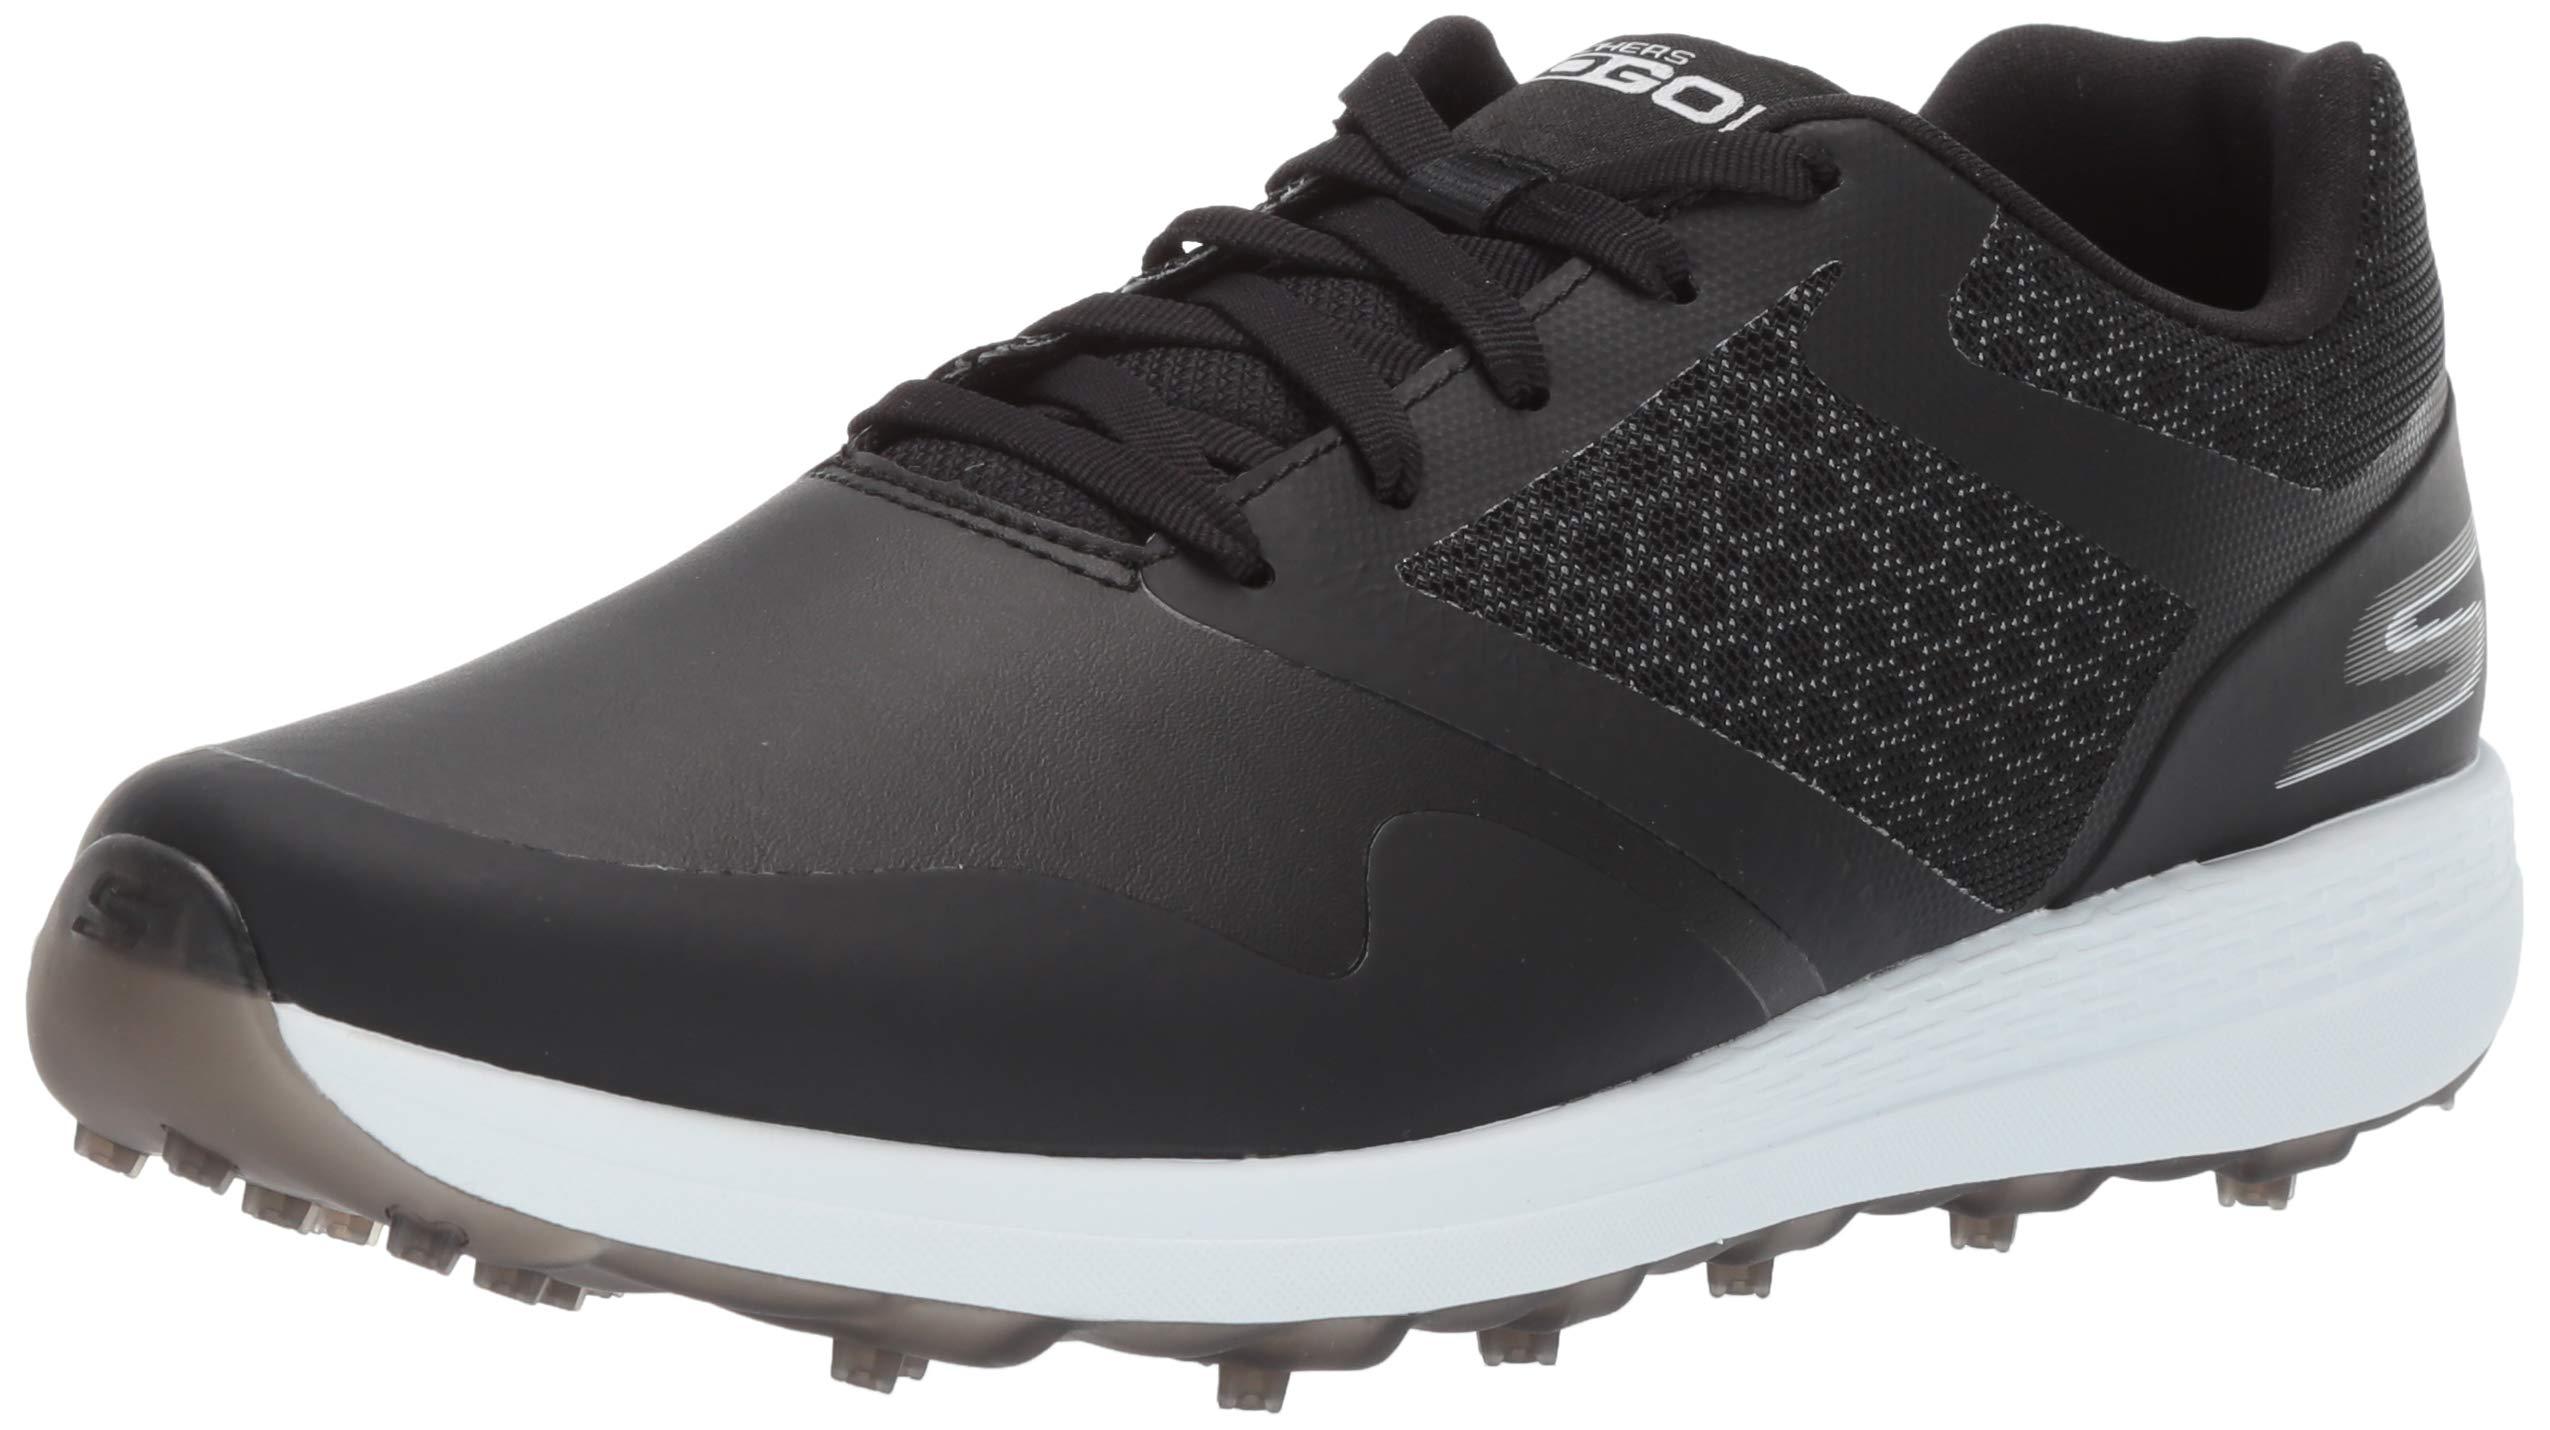 Skechers Women's Max Golf Shoe, Black/White 7 M US